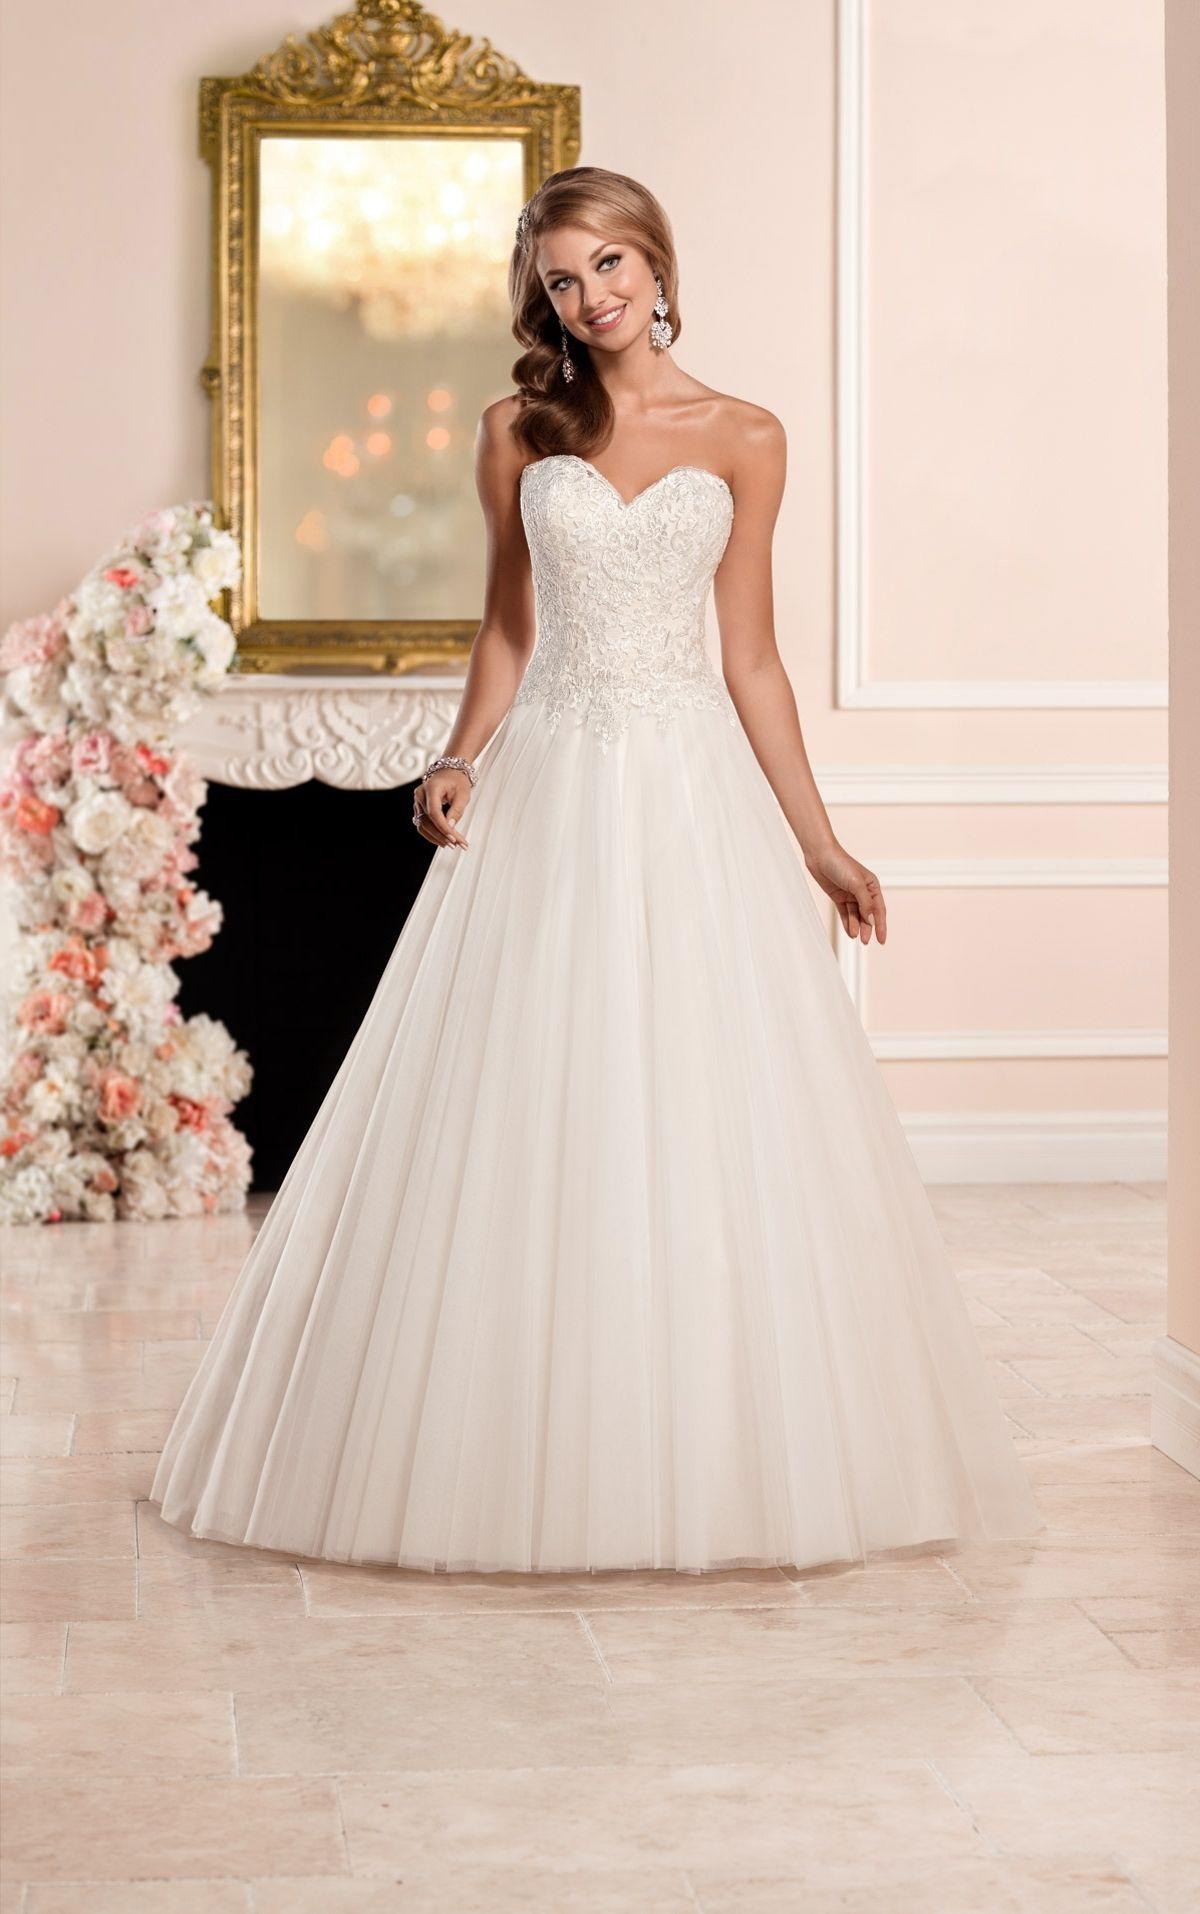 Wedding Dresses Princess Cut